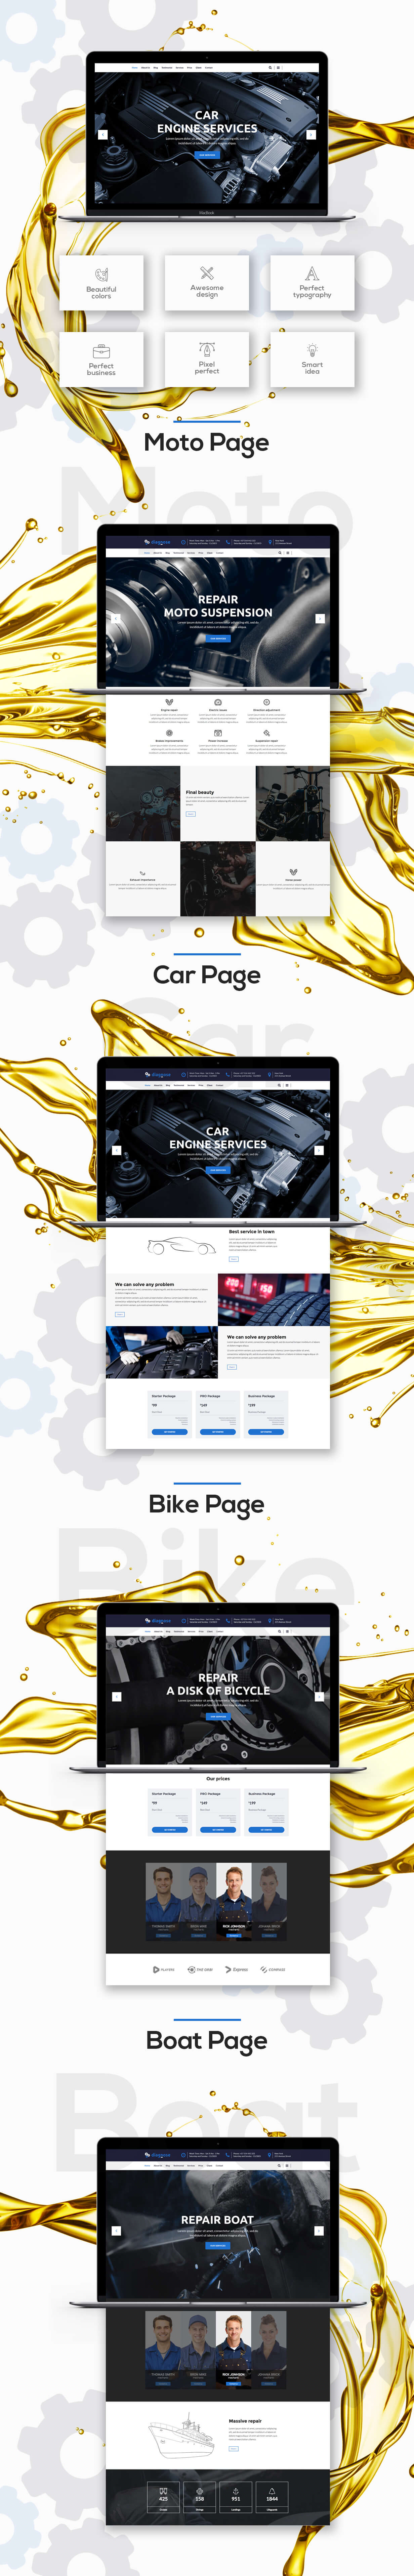 Diagnose - Auto Repair | Mechanic | Workshop WordPress Theme - 3